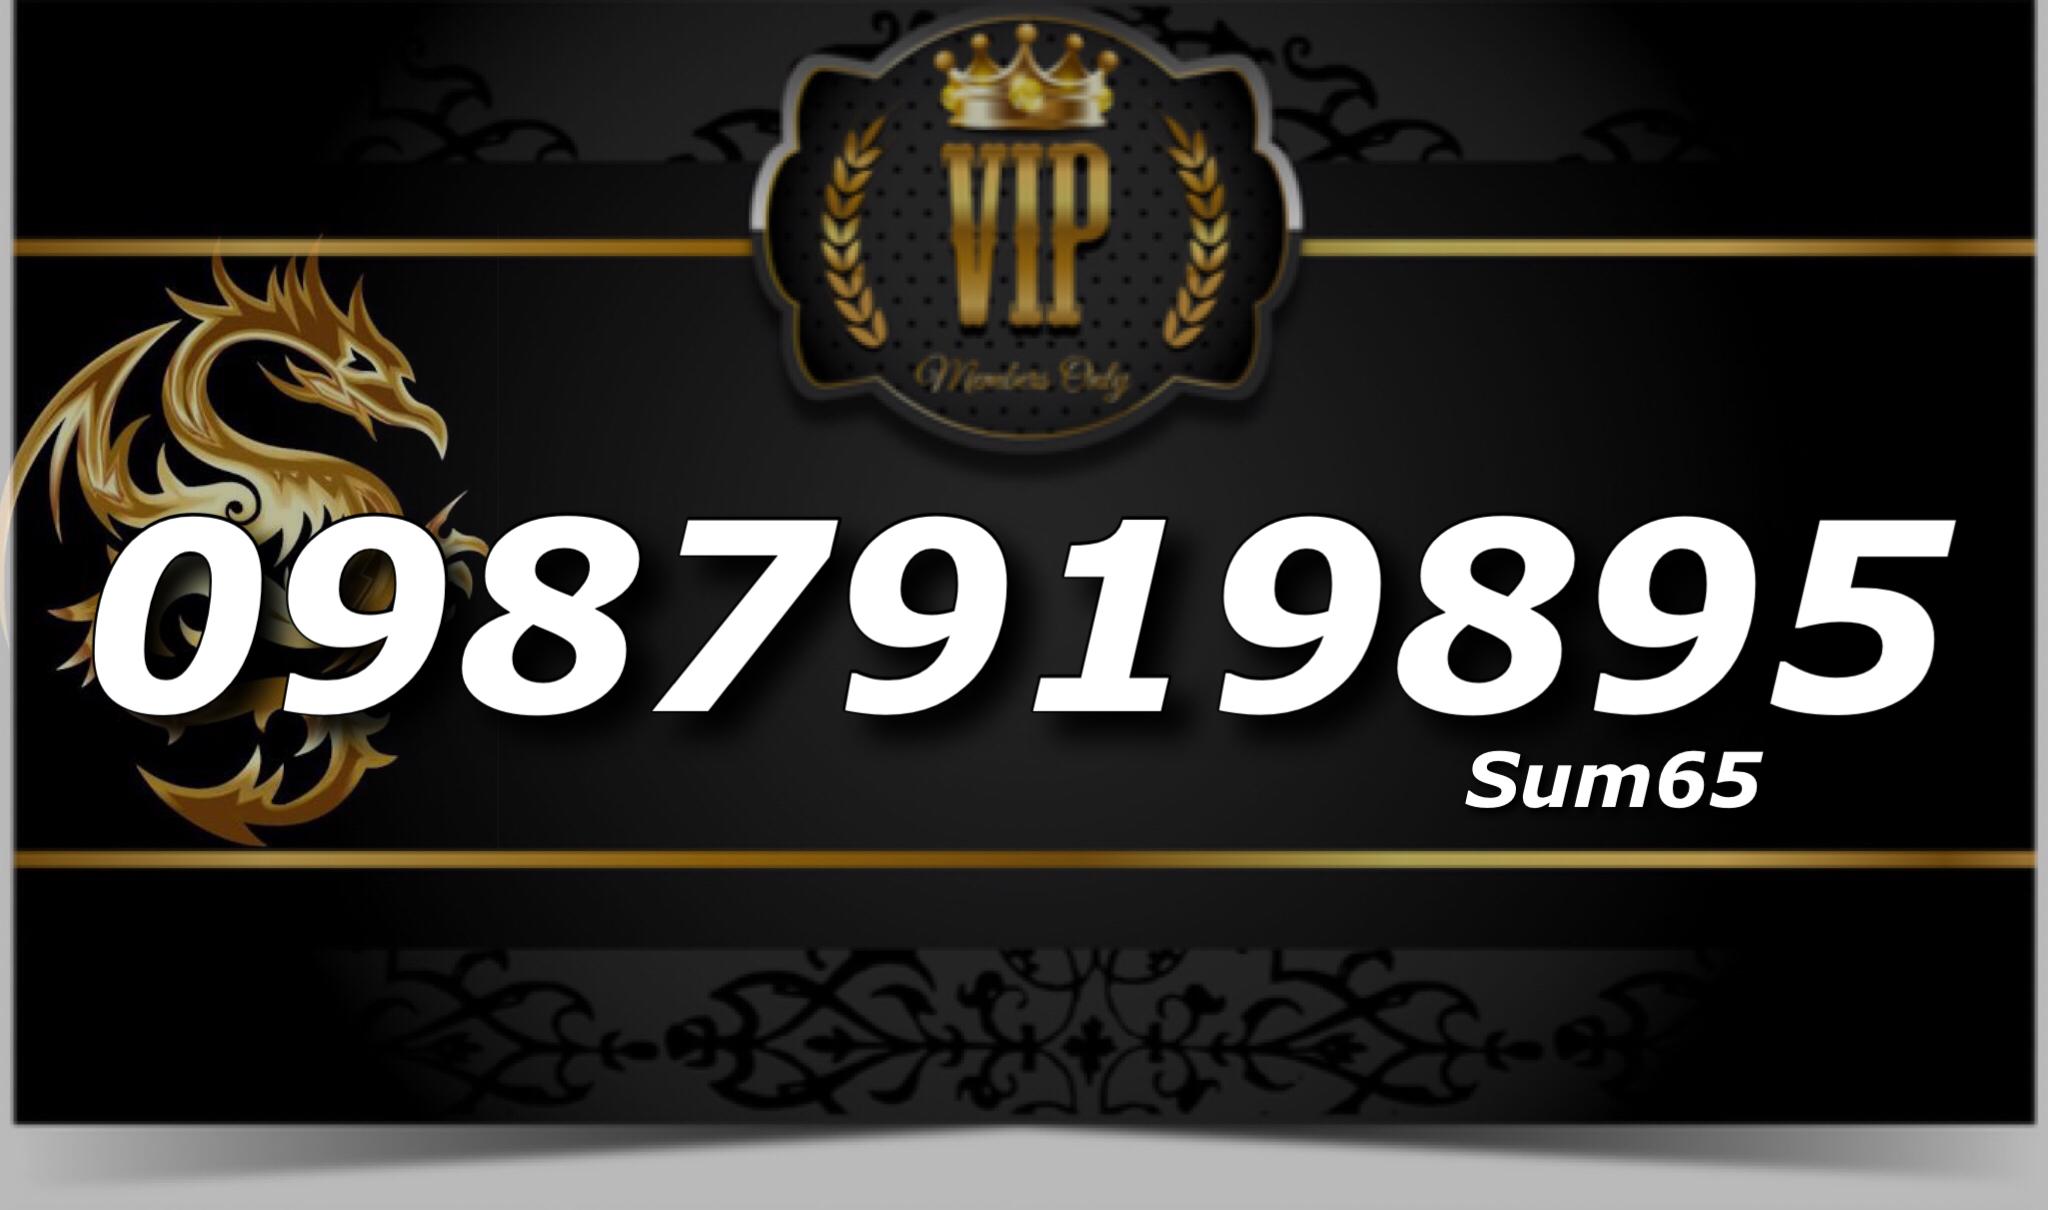 0987919895 (65)